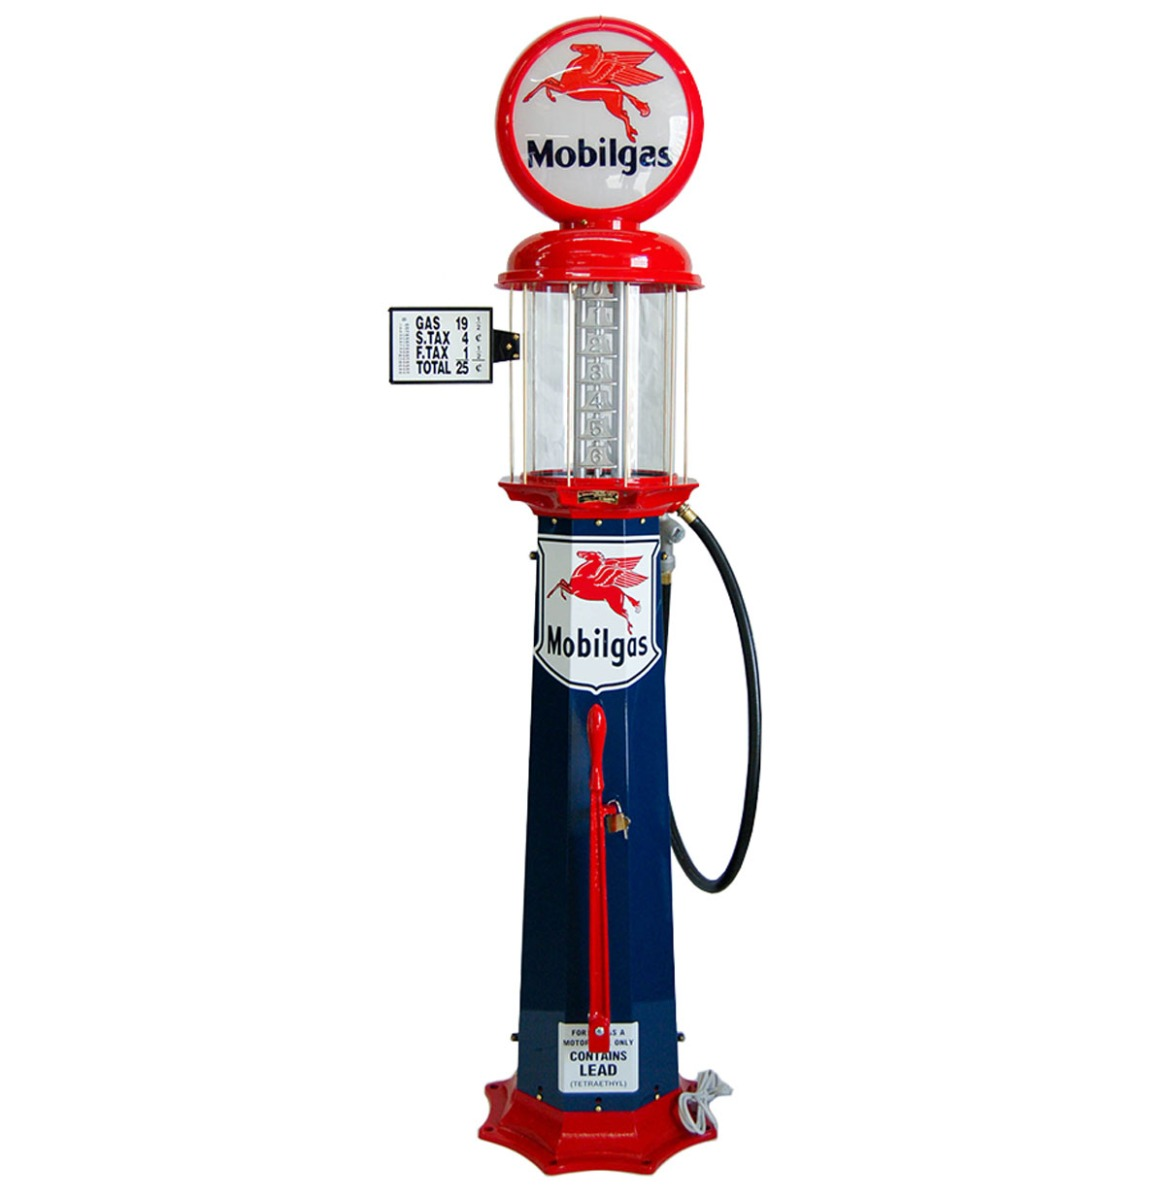 American Mobilgas 6 Gallon Benzinepomp - Rood & Blauw - Reproductie